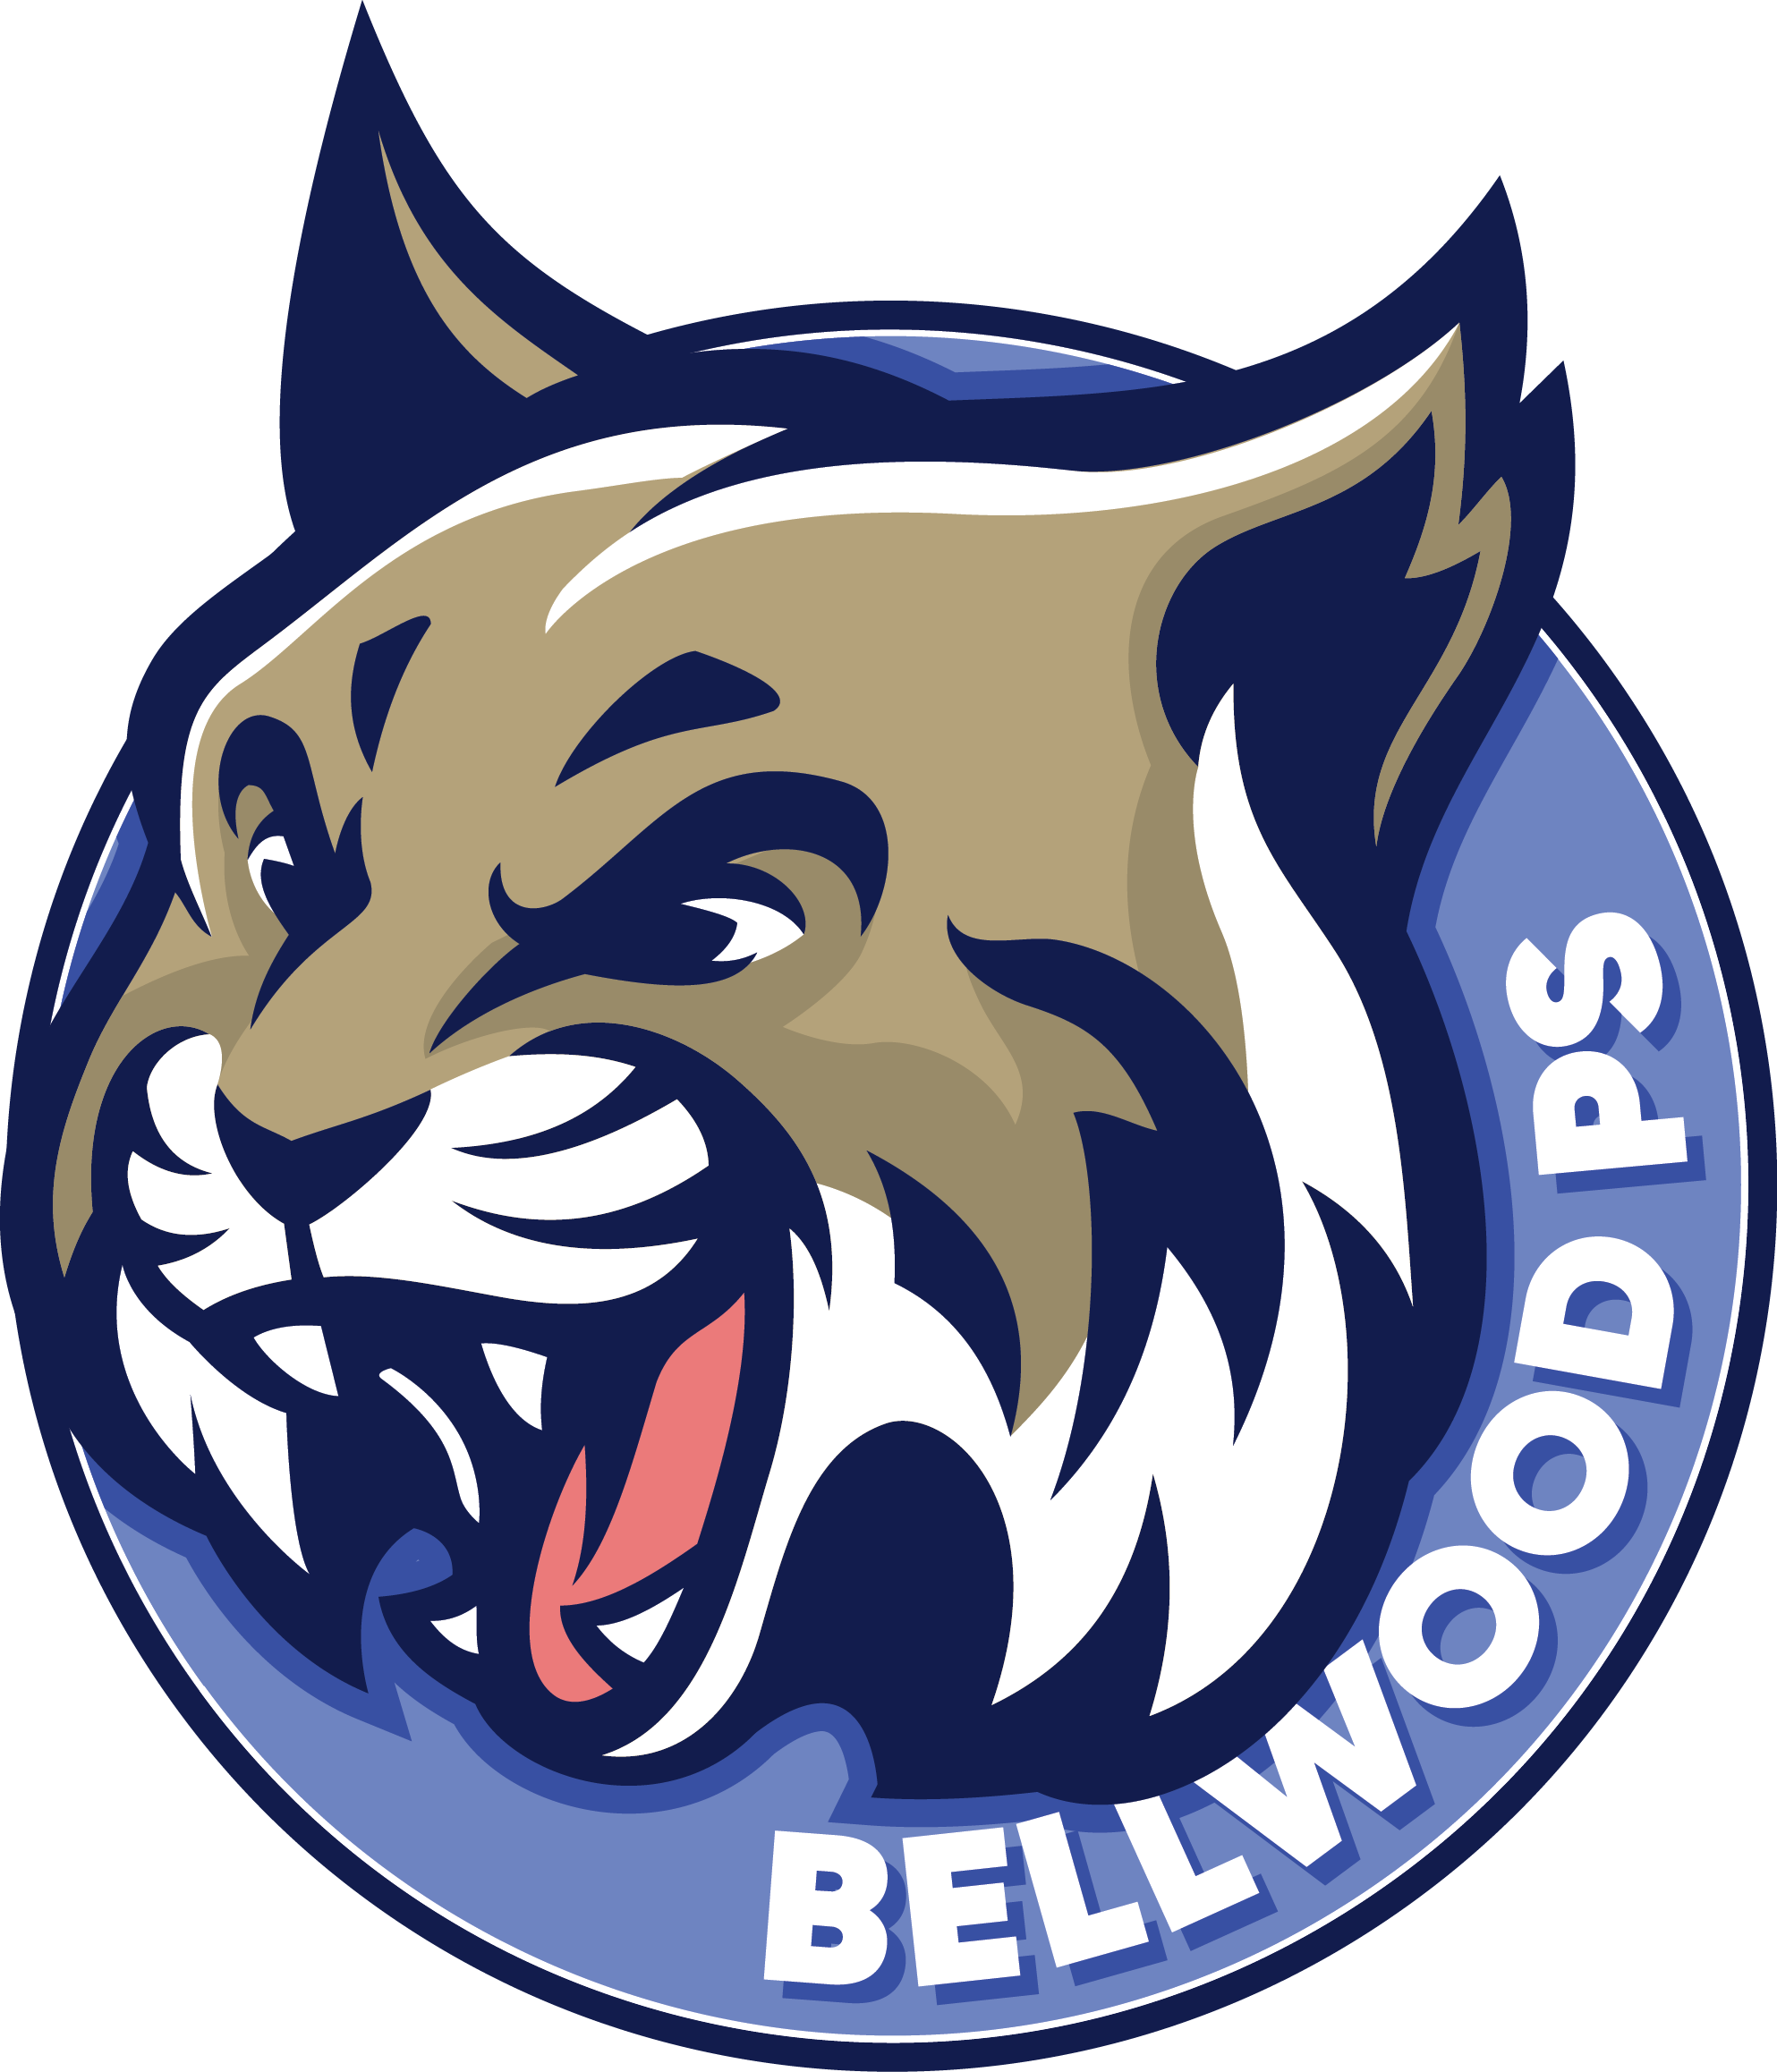 Bellwood Public School logo